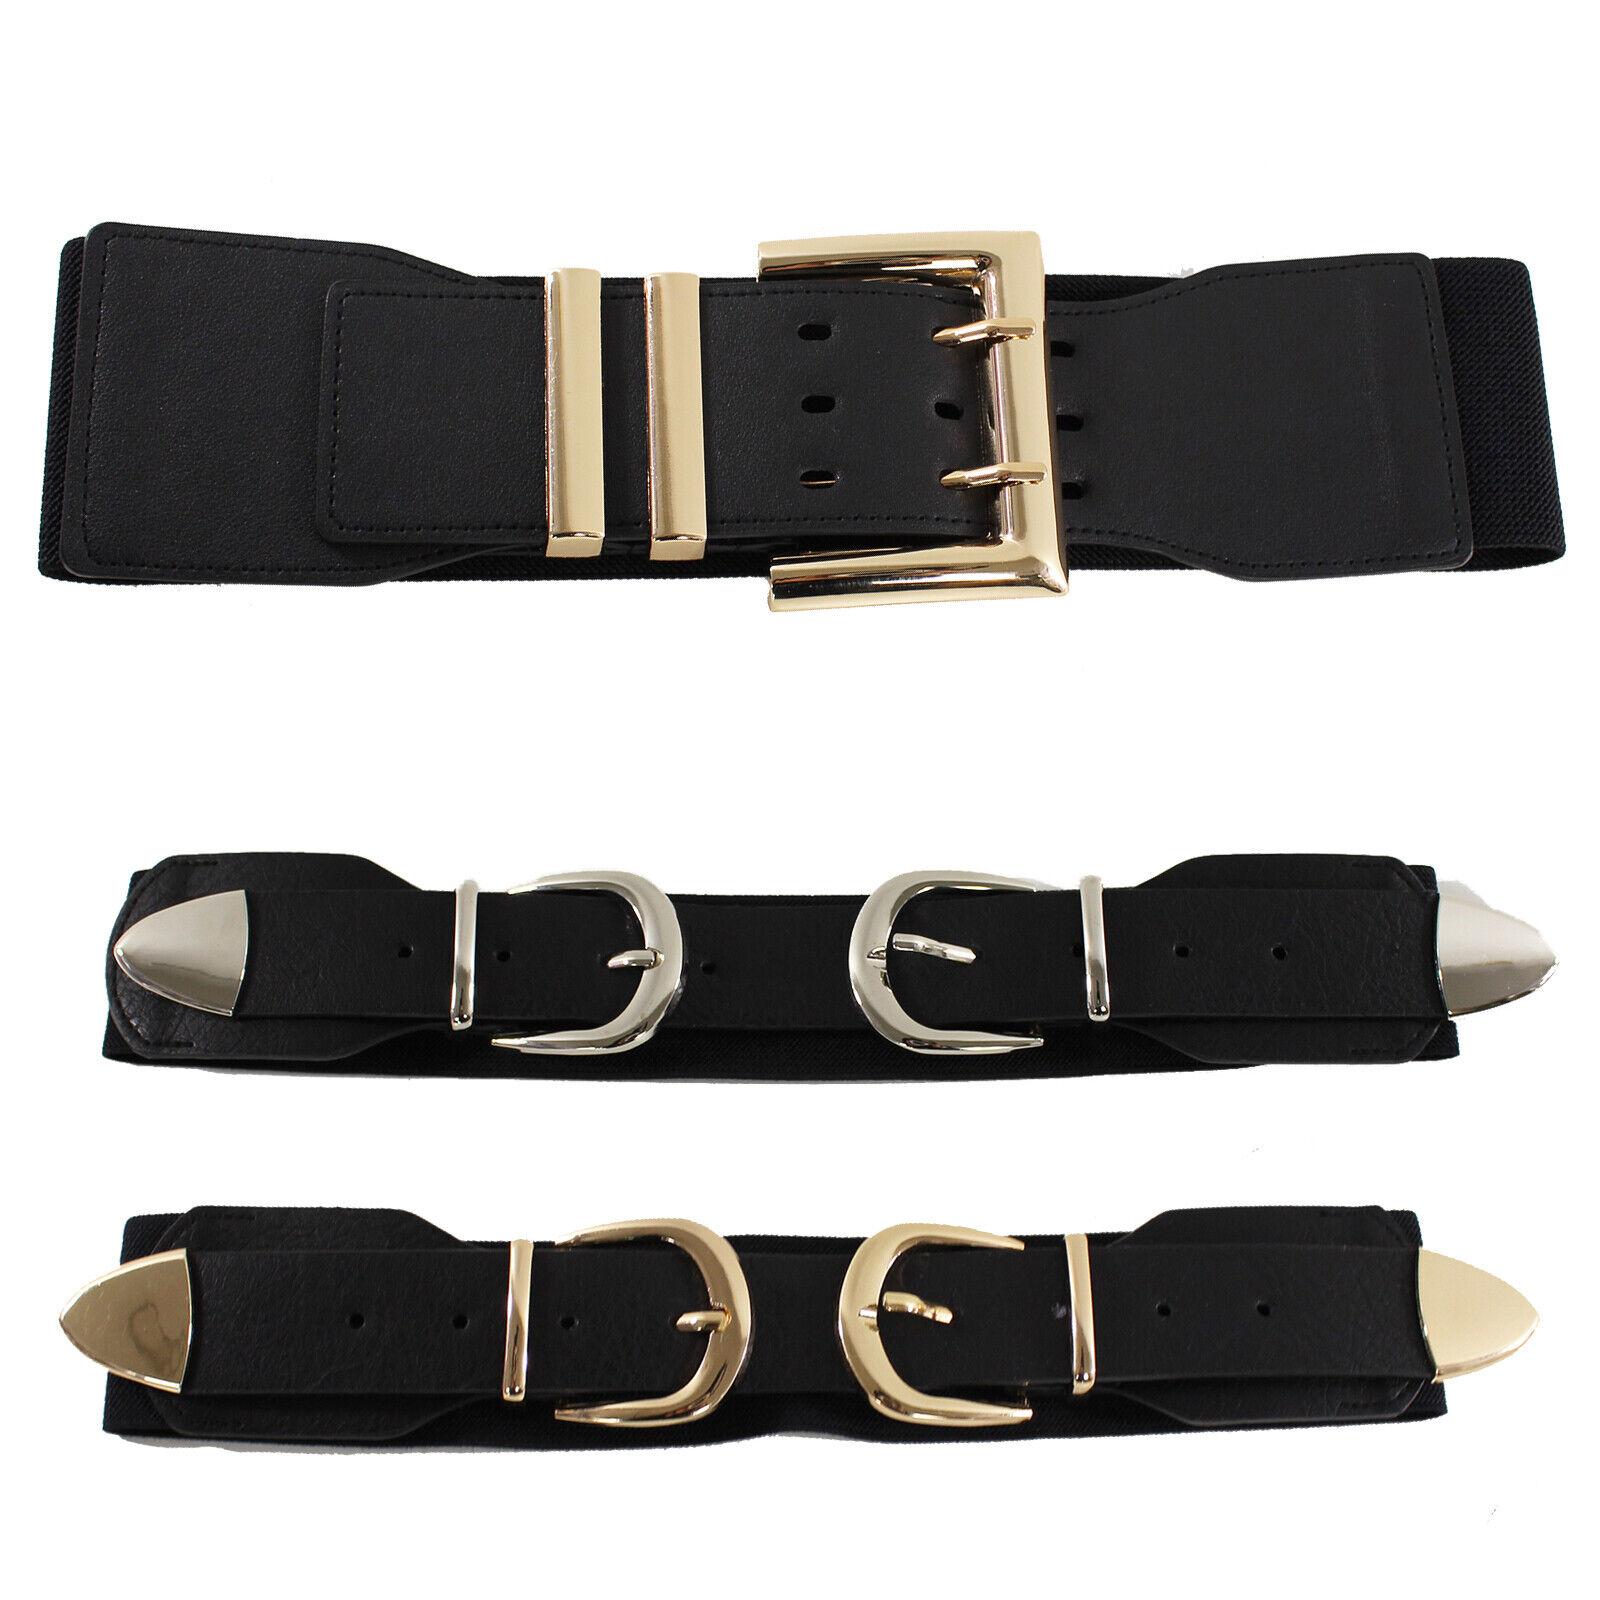 iwobi Cinture da Donna,2 pezzi Elastico Cintura Fiore Decorativa in Metallo,Oro Argento